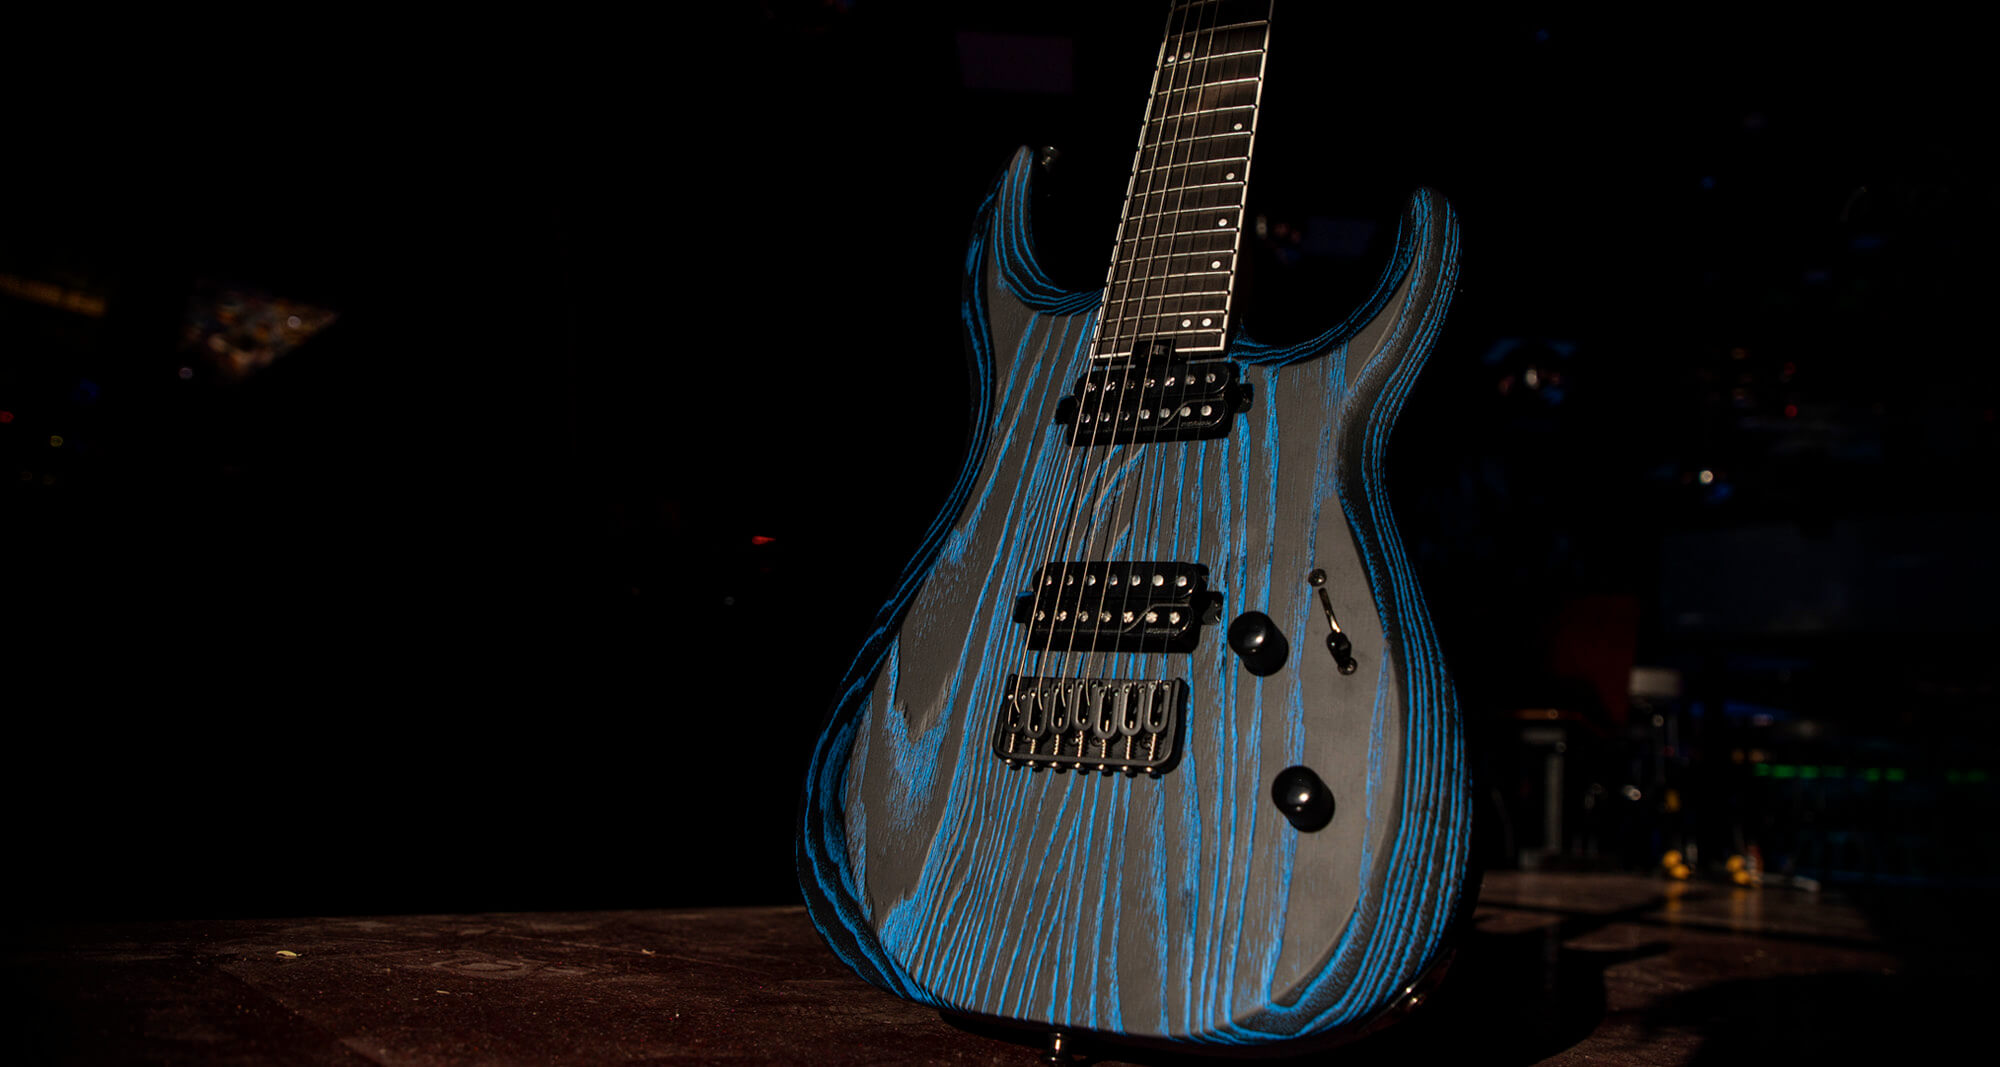 Jackson Guitars on guitar string diagram, jackson electric guitar schematic, jackson flying v wiring, jackson guitar wiring schematics, jackson performer wiring, jca20h diagram, jackson king v schematic, jackson 3-way switches,